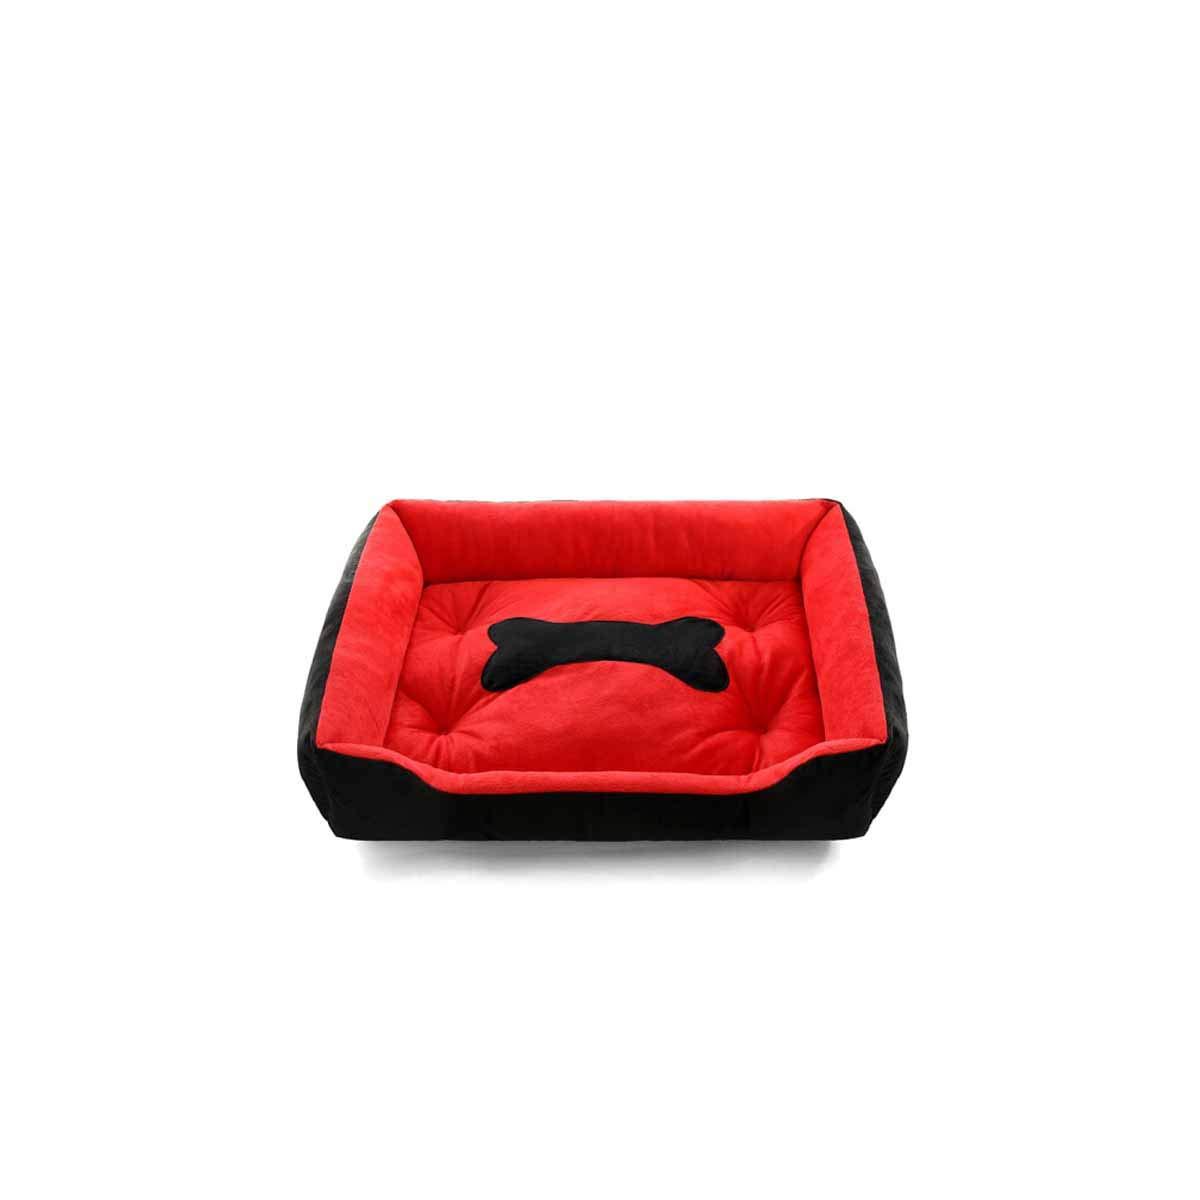 Black XLMuziwenju Kennel, Large, Medium and Small Four Seasons Universal Dog Supplies, Dog Mats, Large Dog Sleeping Mats, Mattresses, Pet Supplies, Soft and Comfortable Warm Cat Beds,